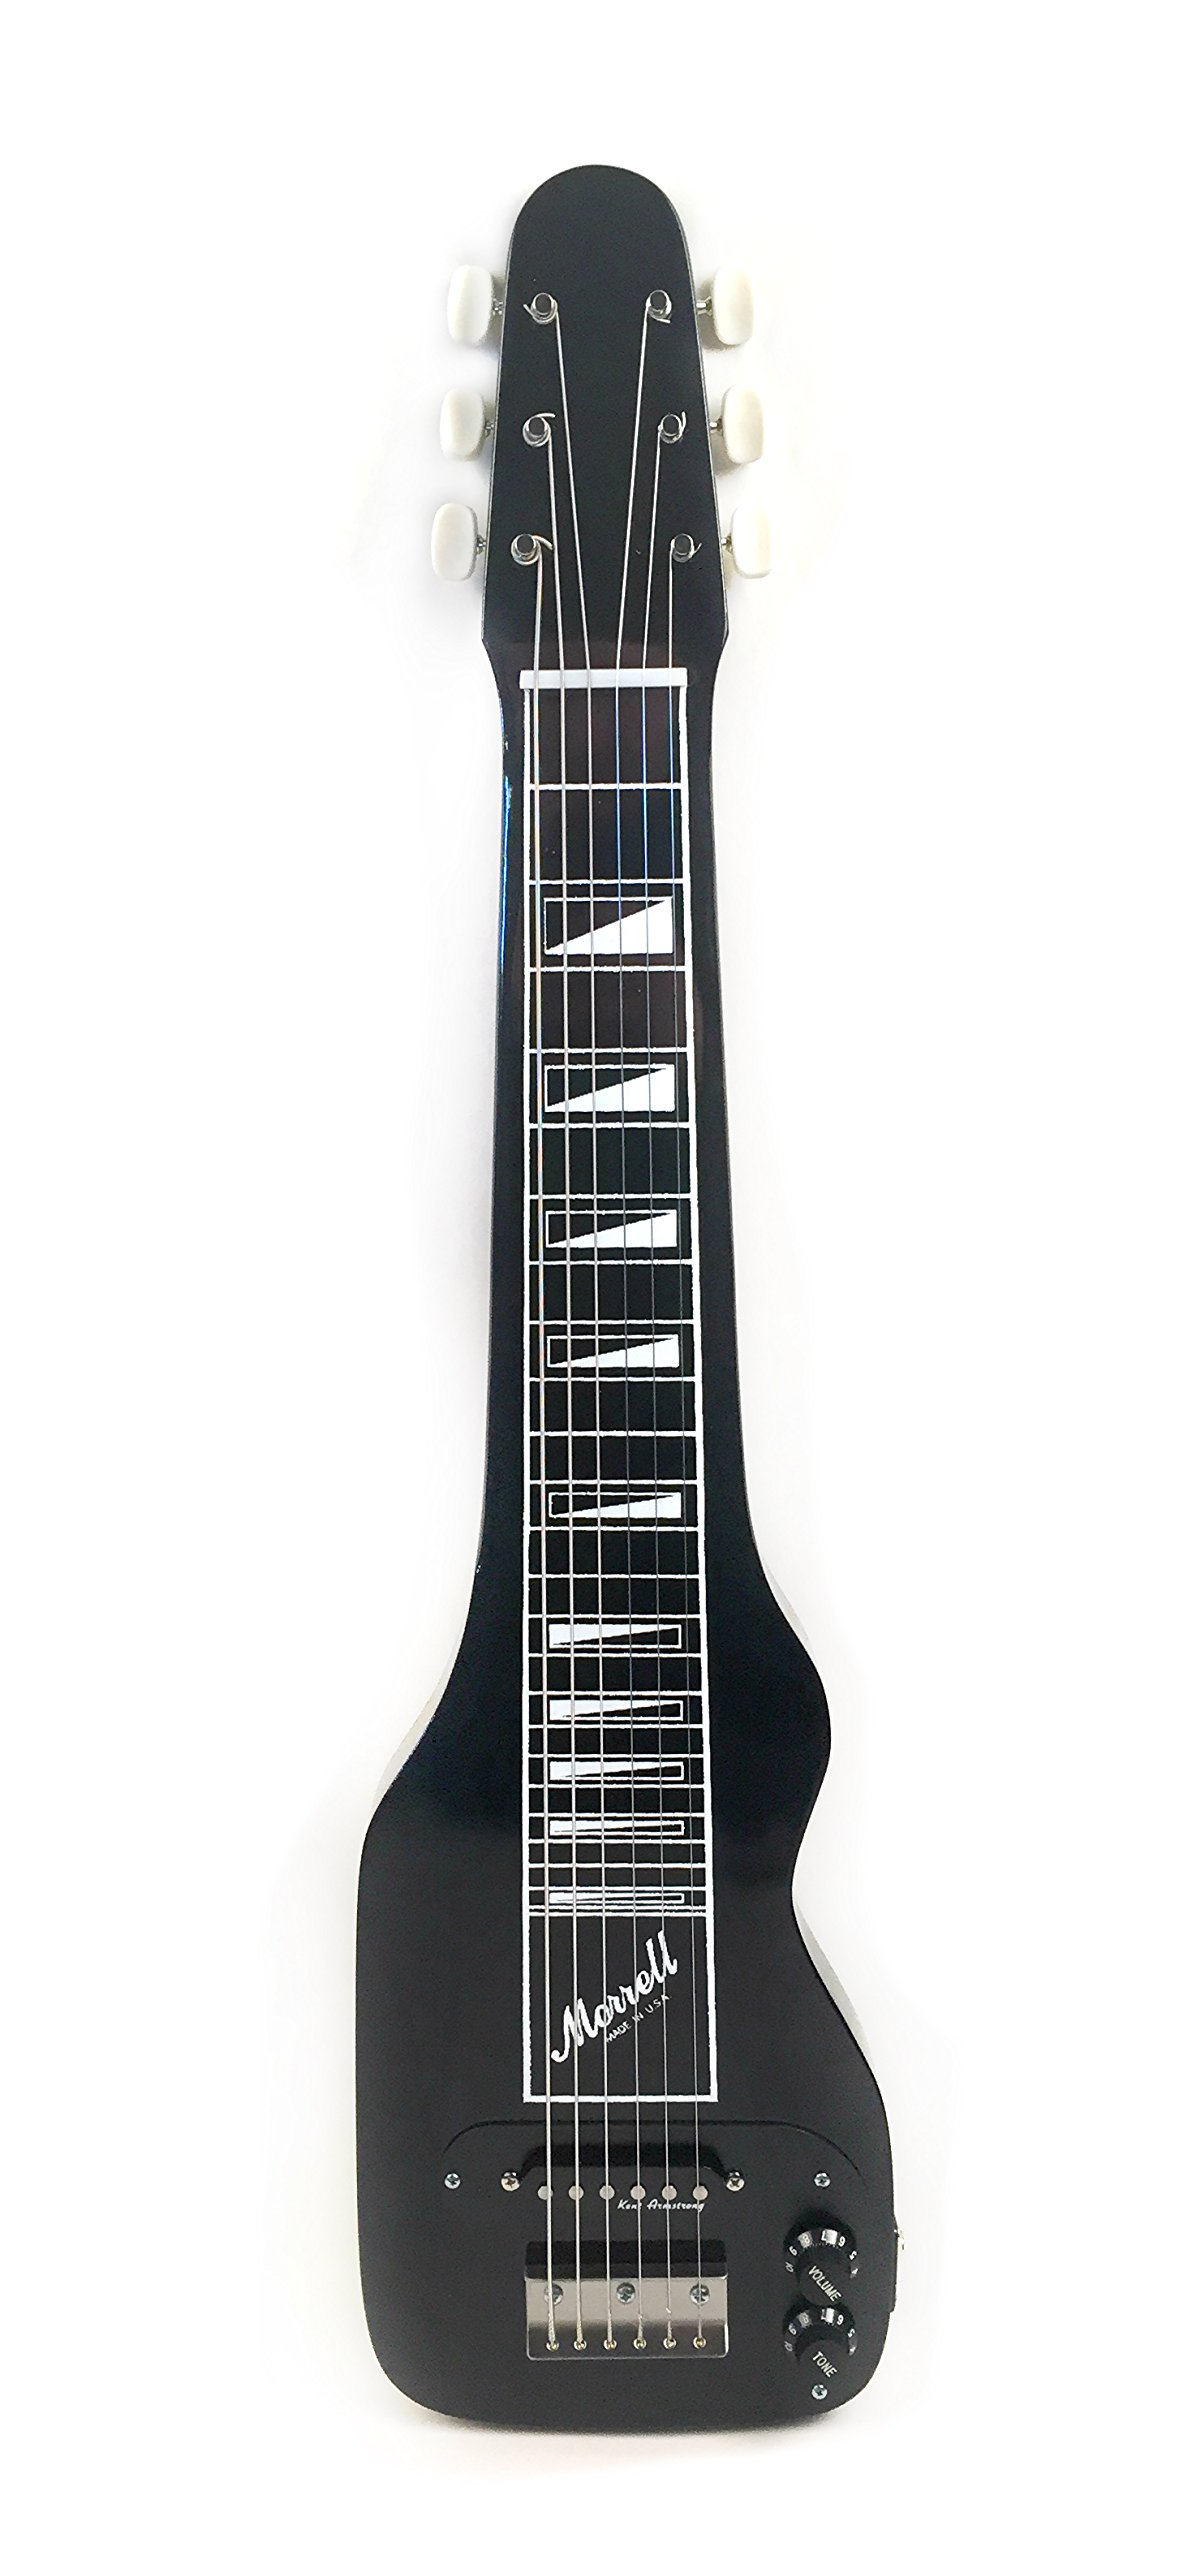 Morrell PLUS Series 6-String Lap Steel Guitar Gloss Black Finish USA